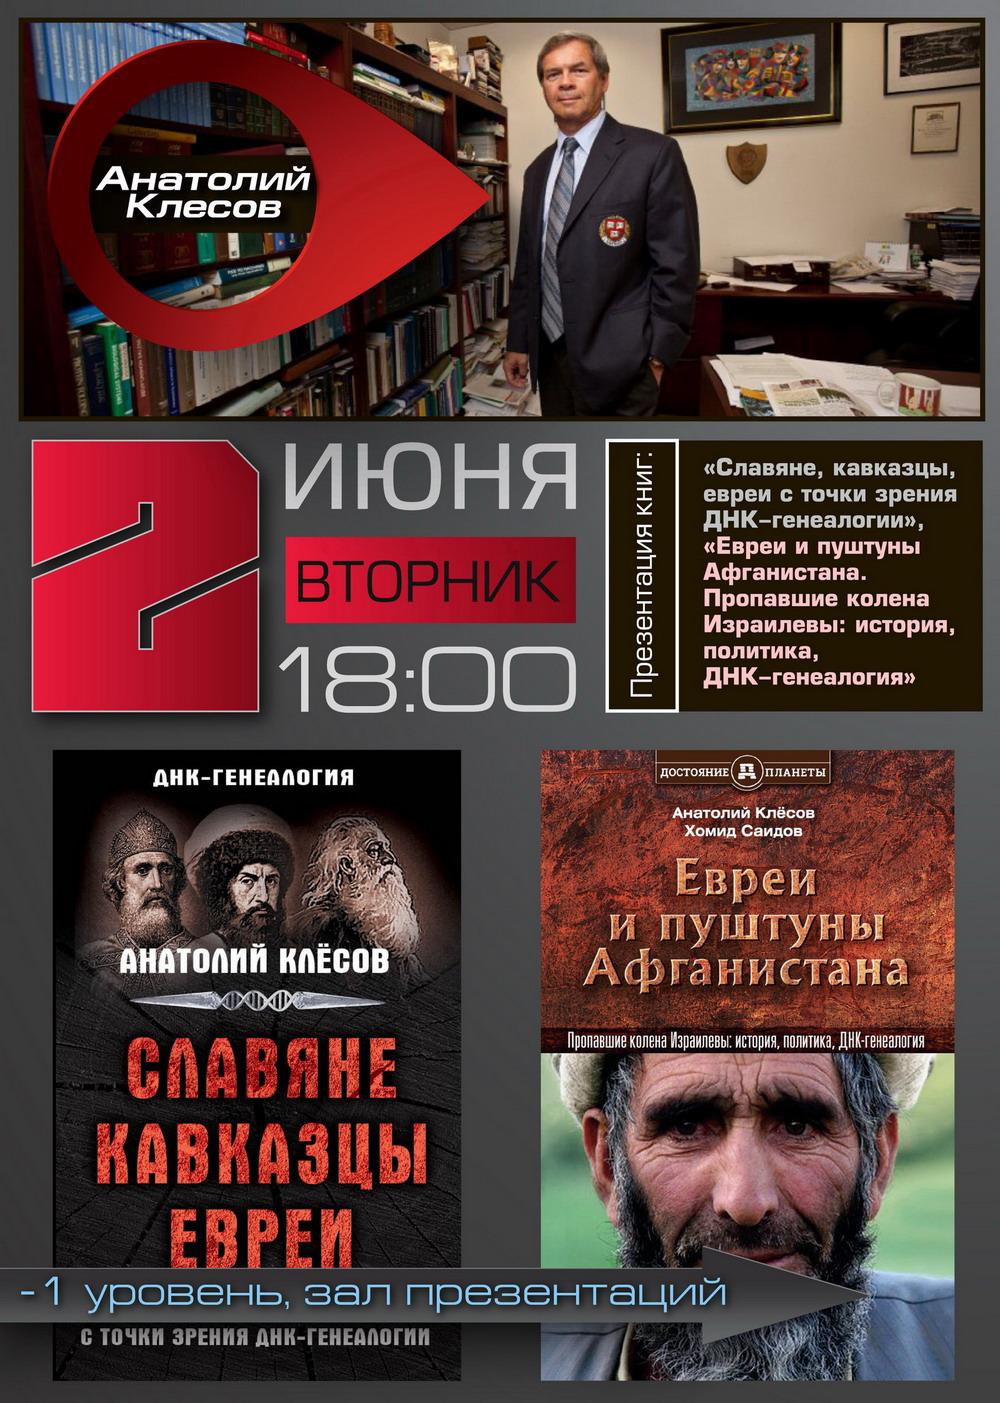 http://pereformat.ru/wp-content/uploads/2015/05/biblio-globus-02062015.jpg